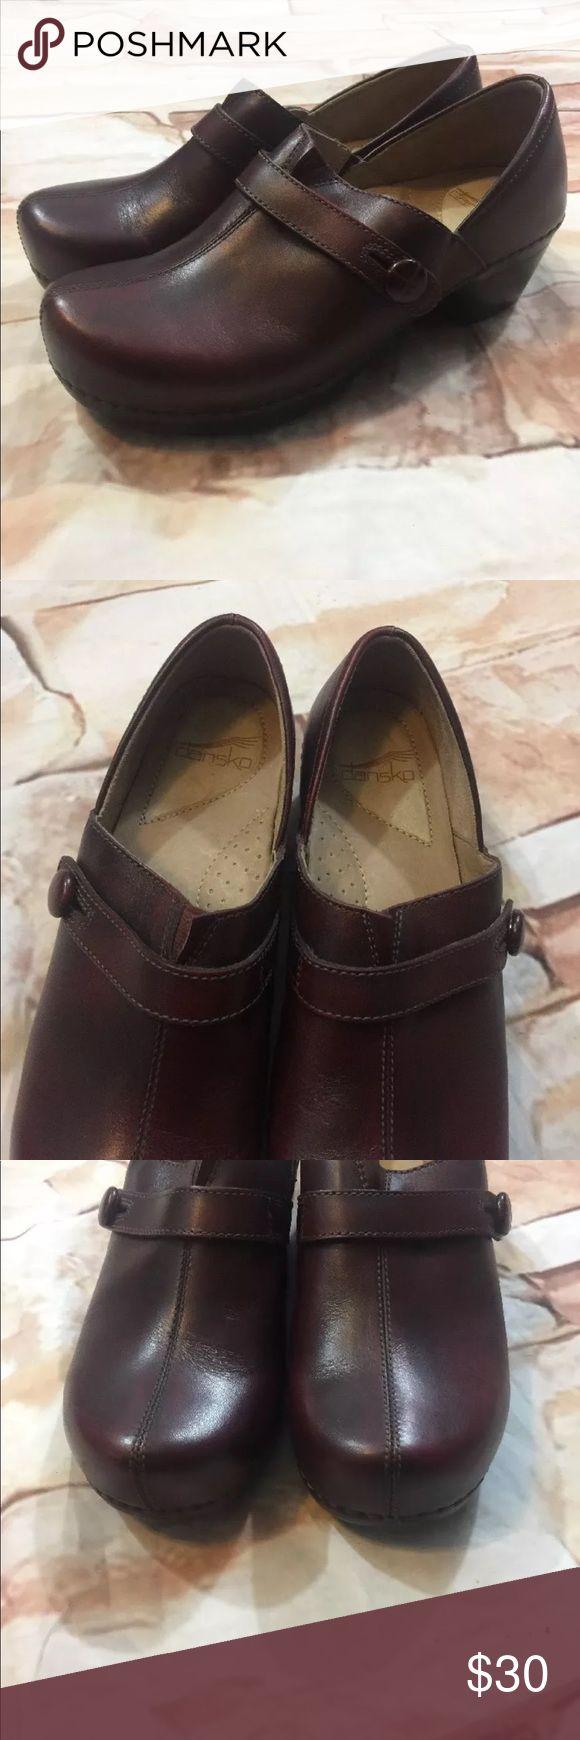 Dansko Solstice Cordovan Brushoff Clog Dansko  Solstice Cordovan Brushoff Clog  Size 39  Brown Leather Slip On Shoes  EUC Dansko Shoes Mules & Clogs